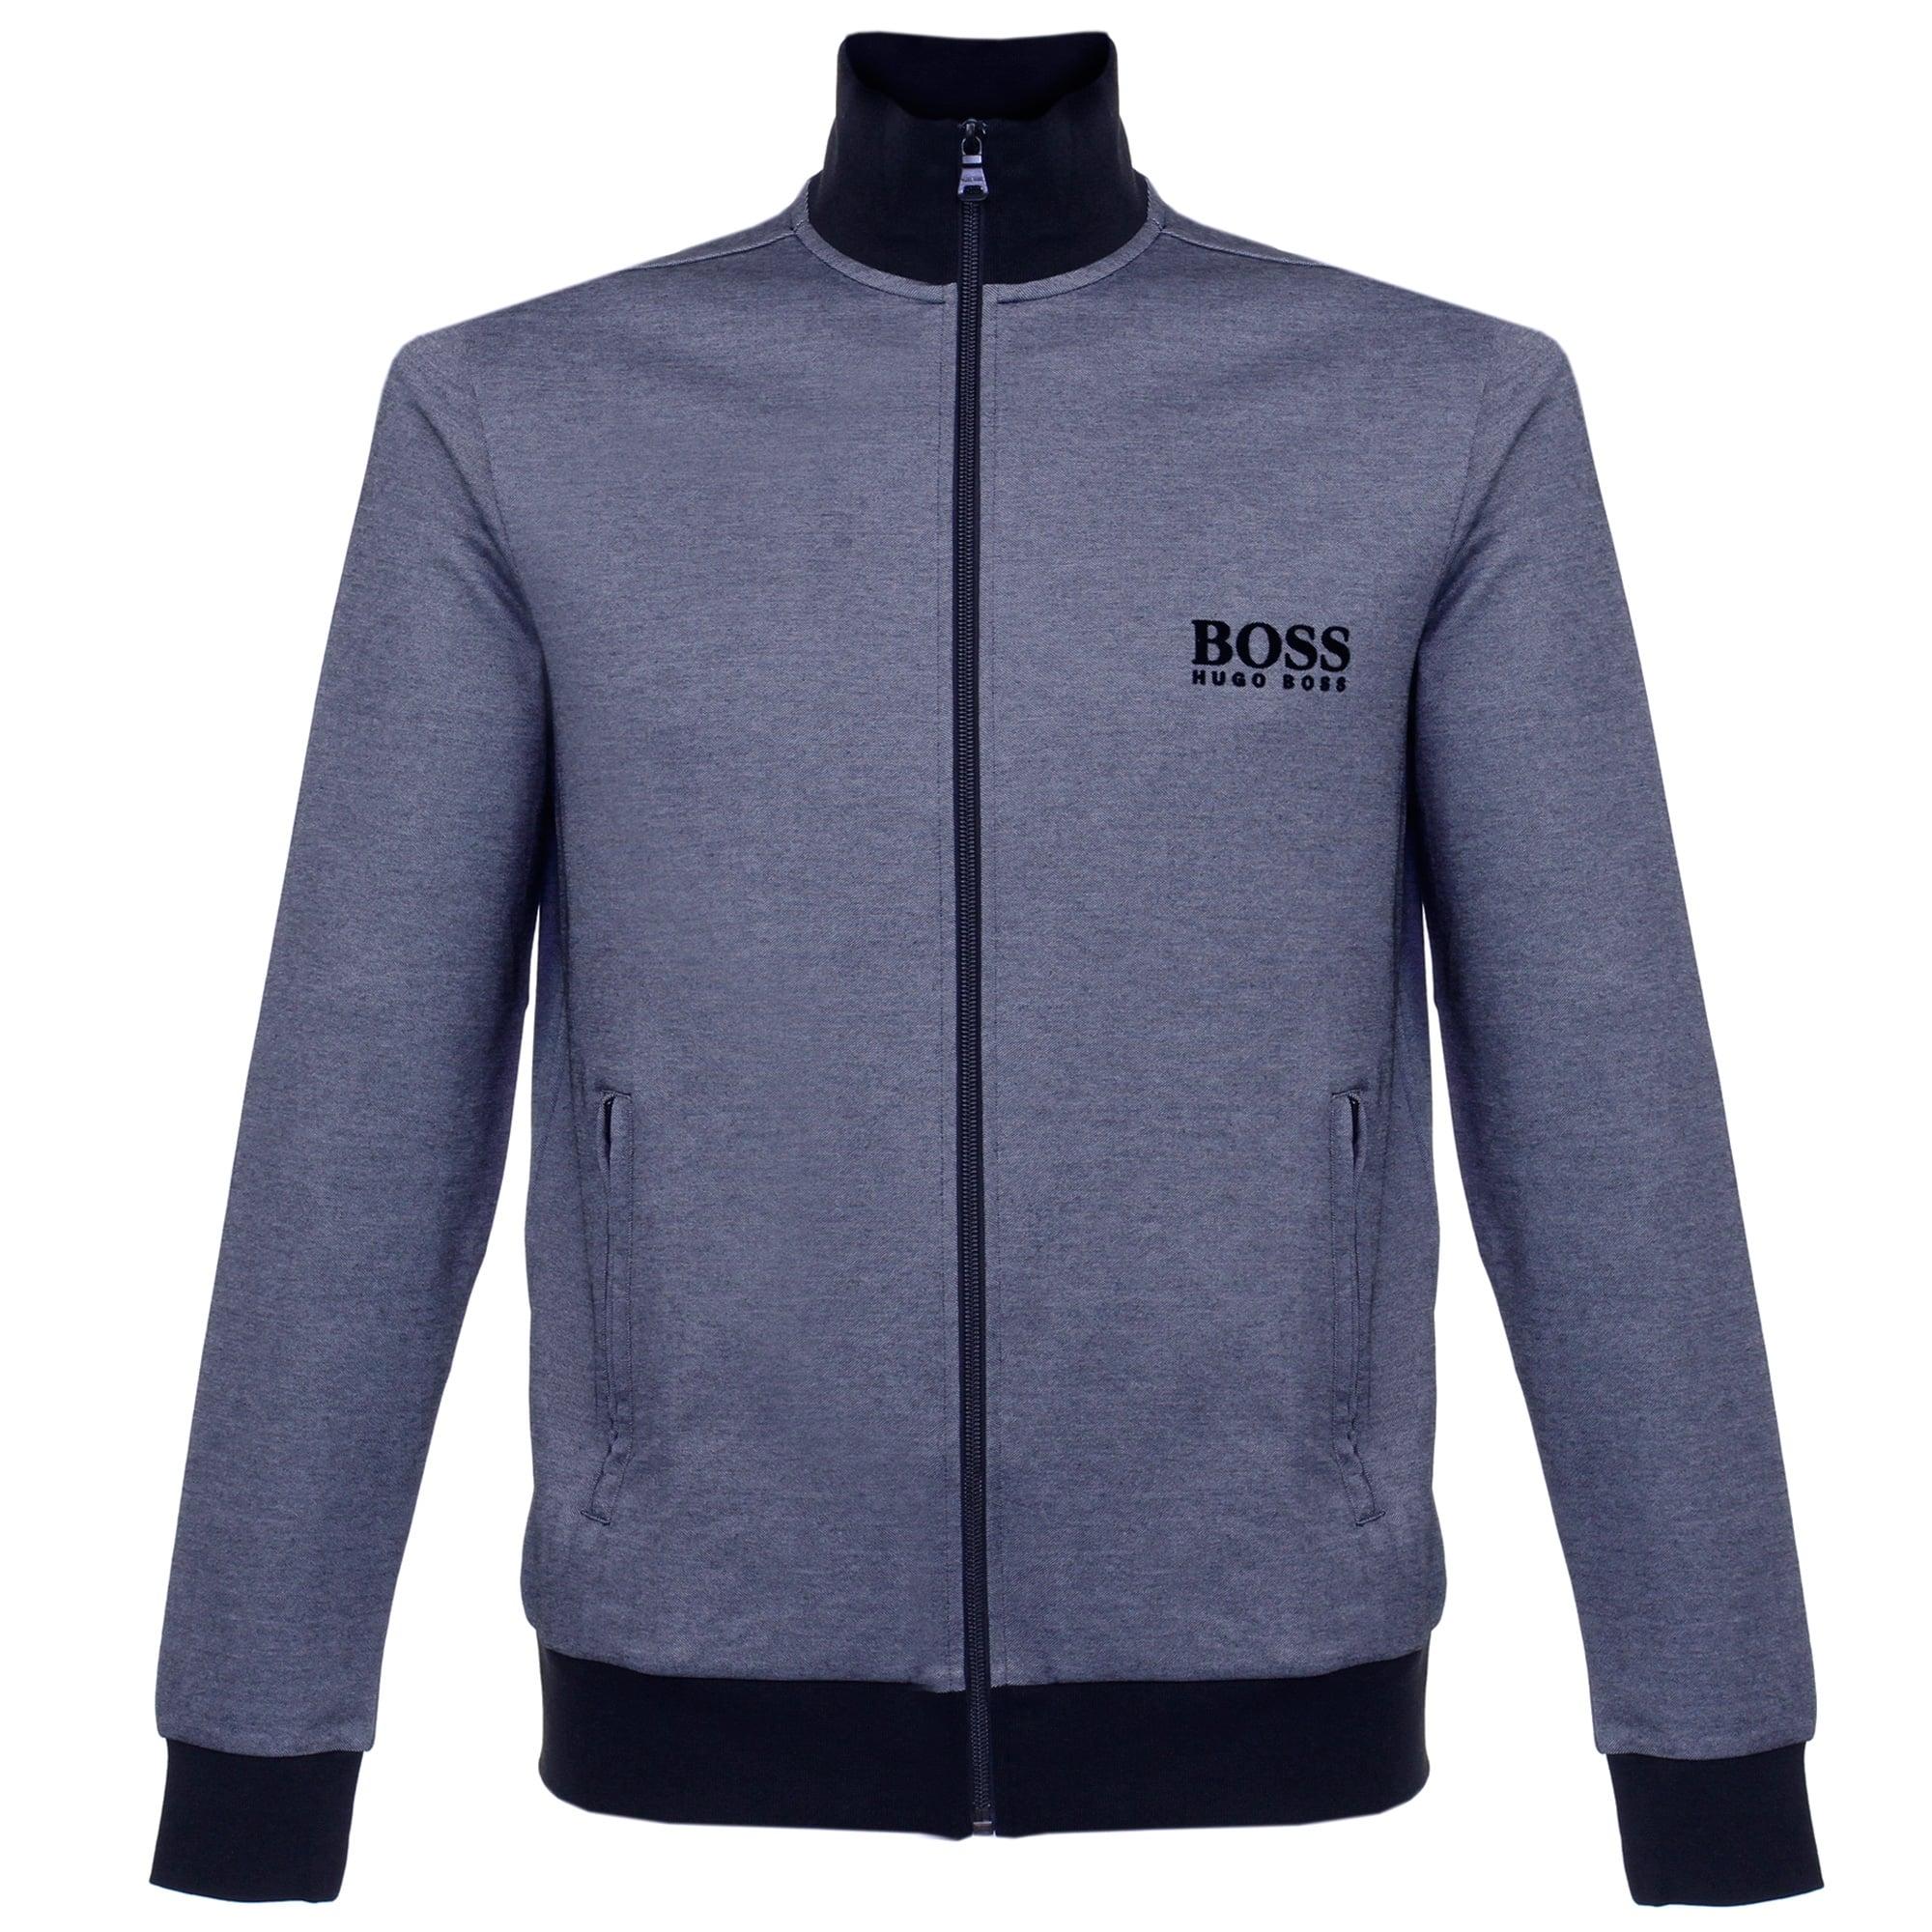 fc1be406681 Hugo Boss Jacket Zip Blue Track Top 50326828